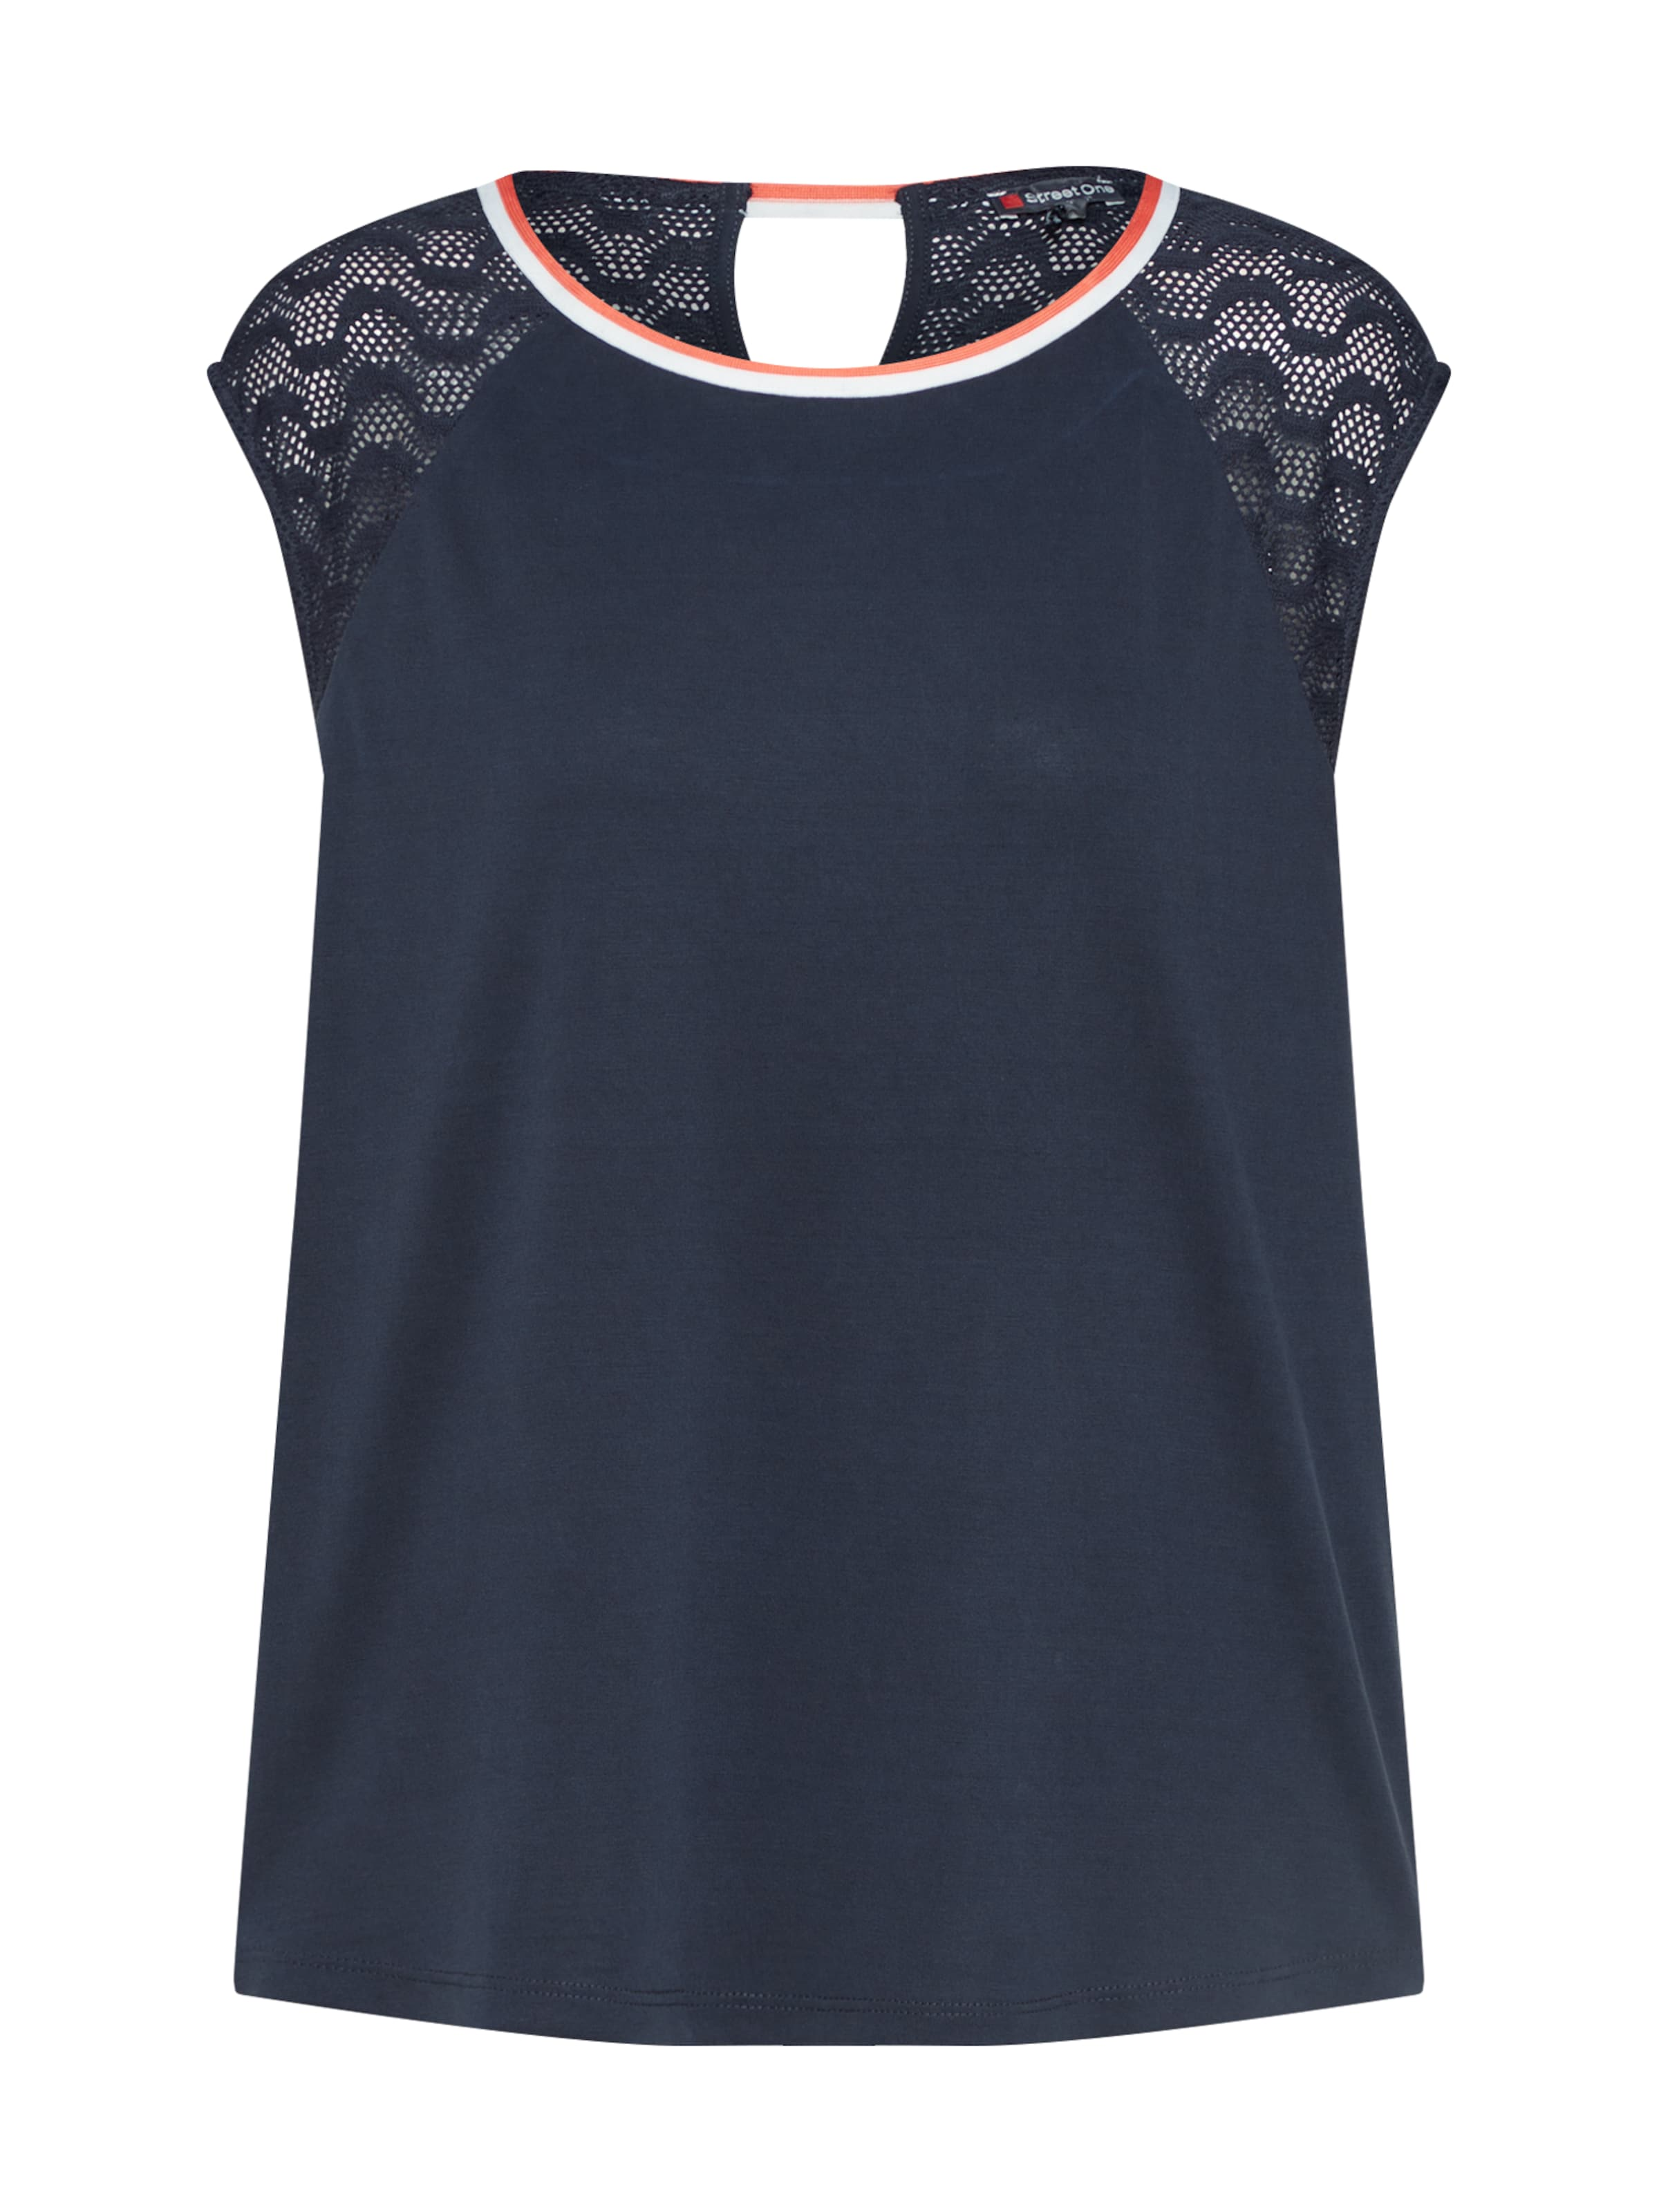 Shirt In One 'abelina' Grau Street OulPkXZwiT